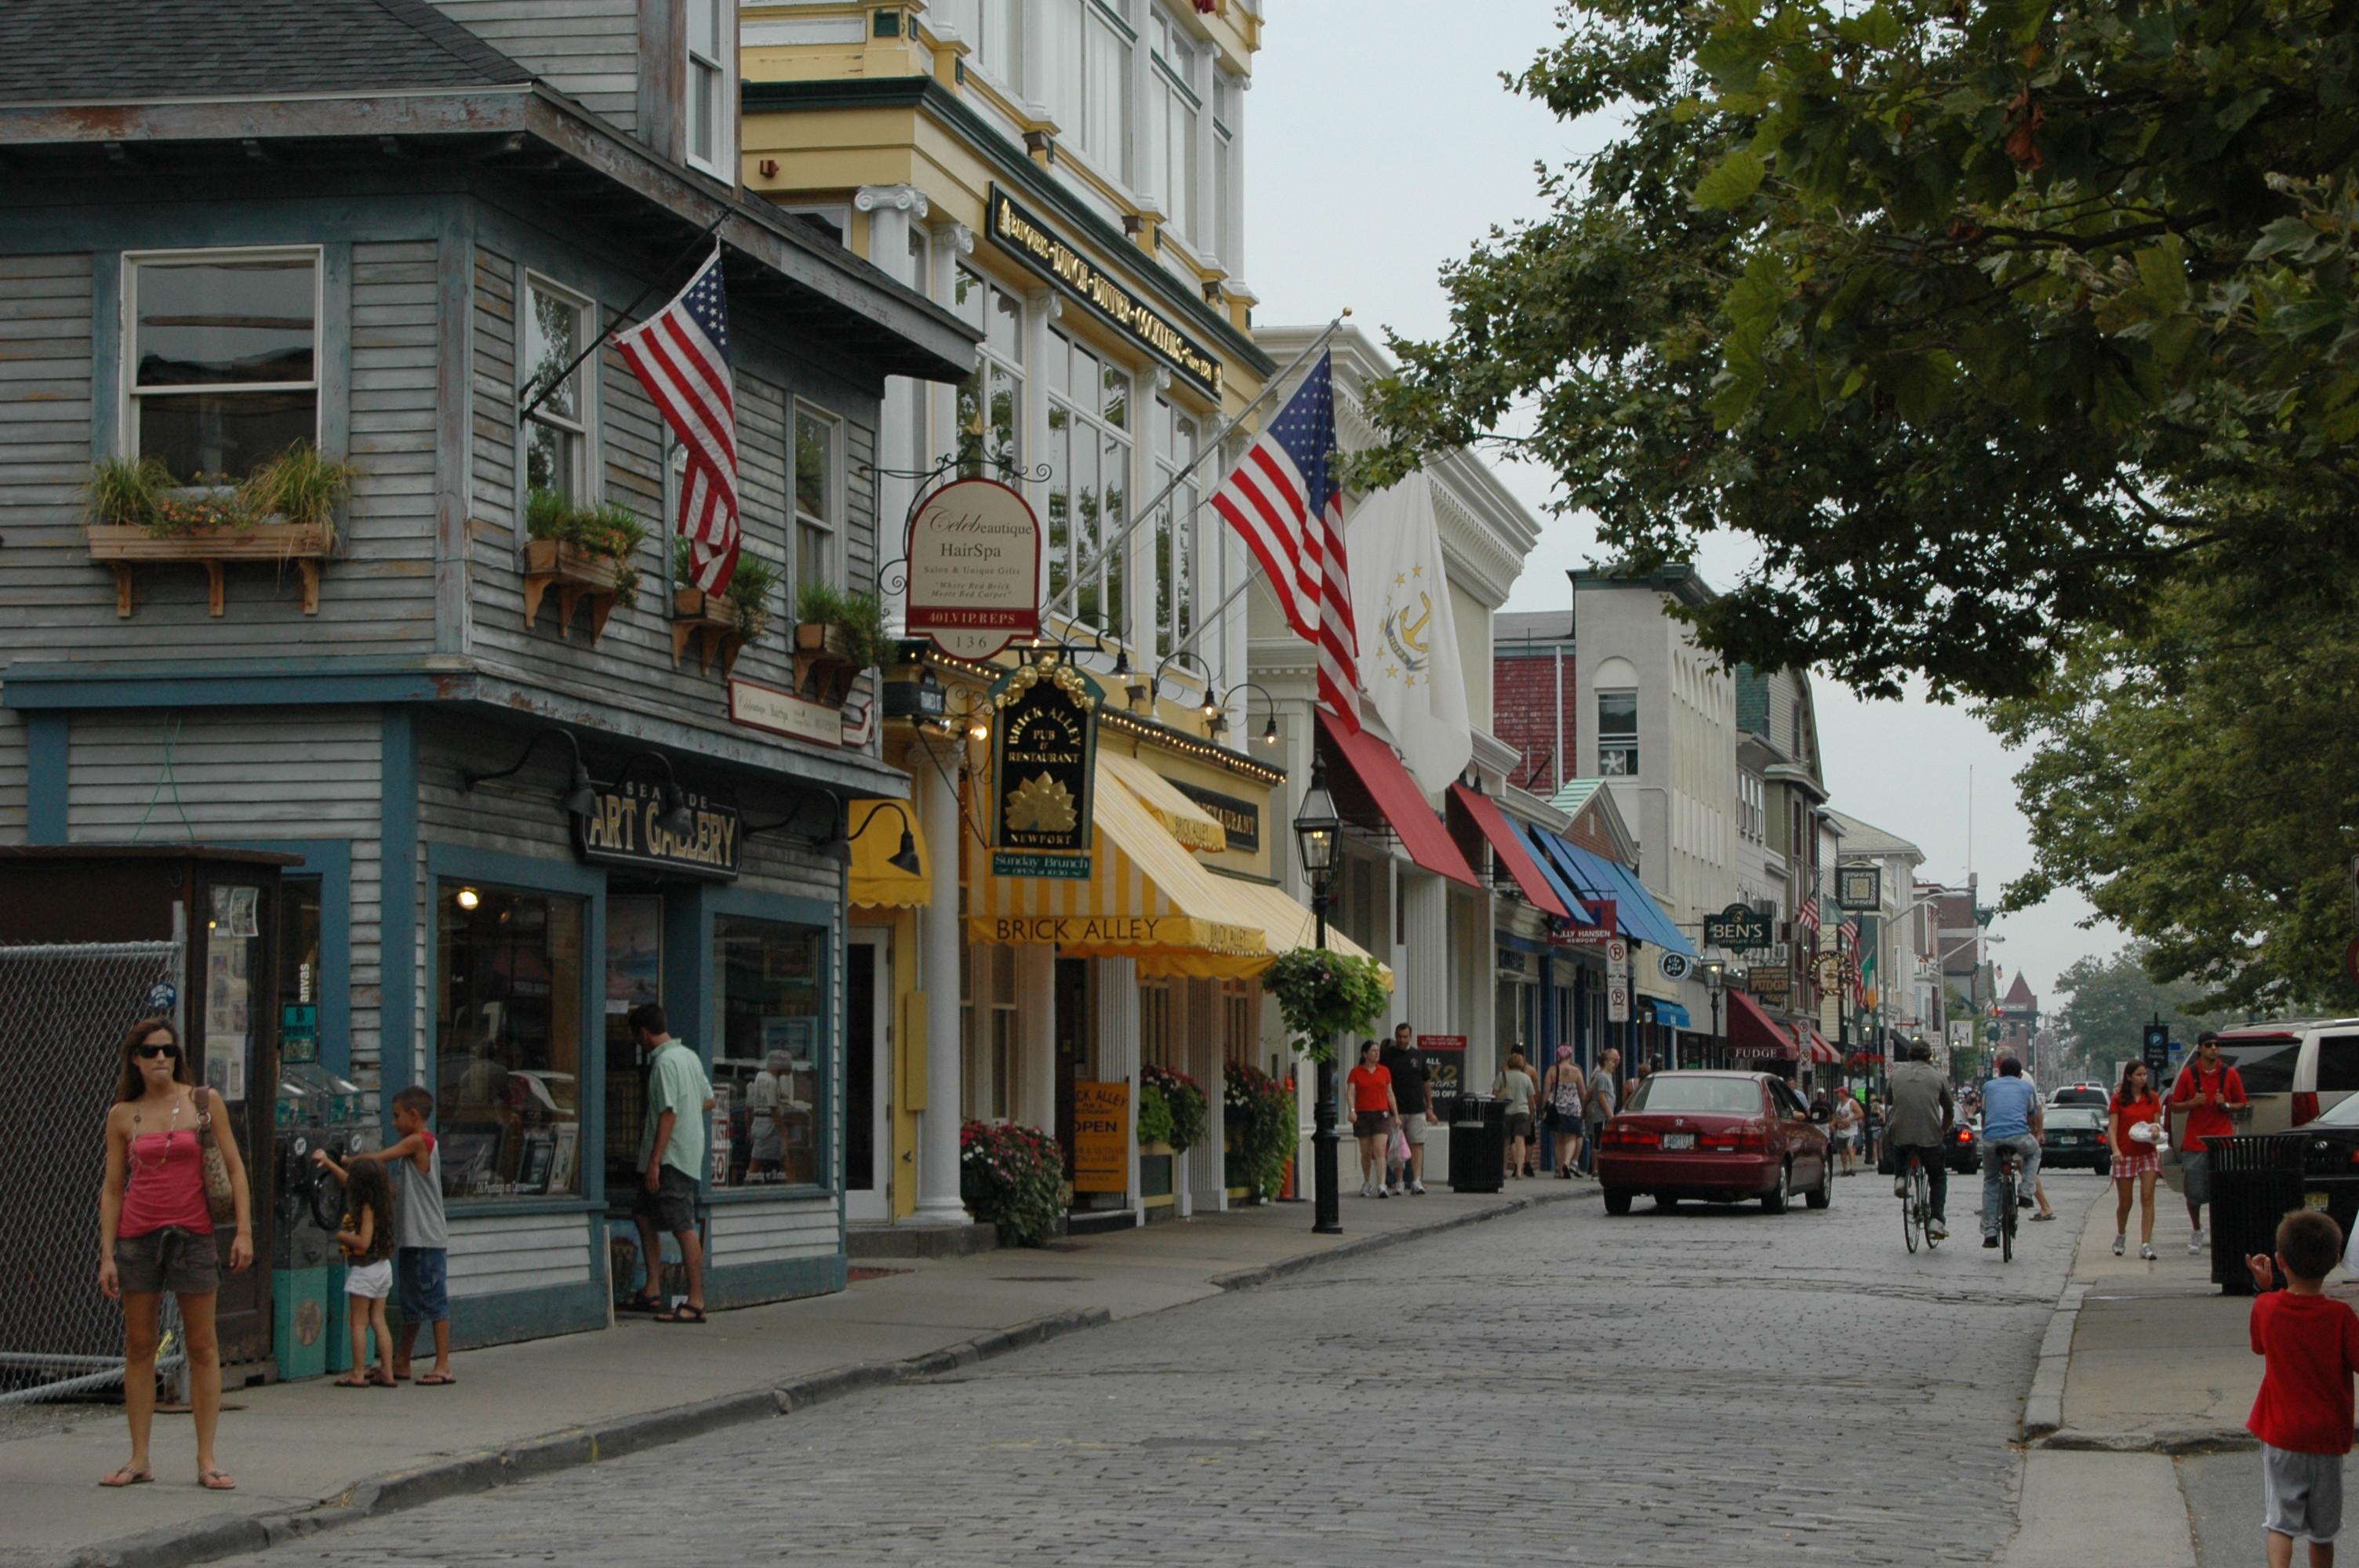 11. Rhode Island